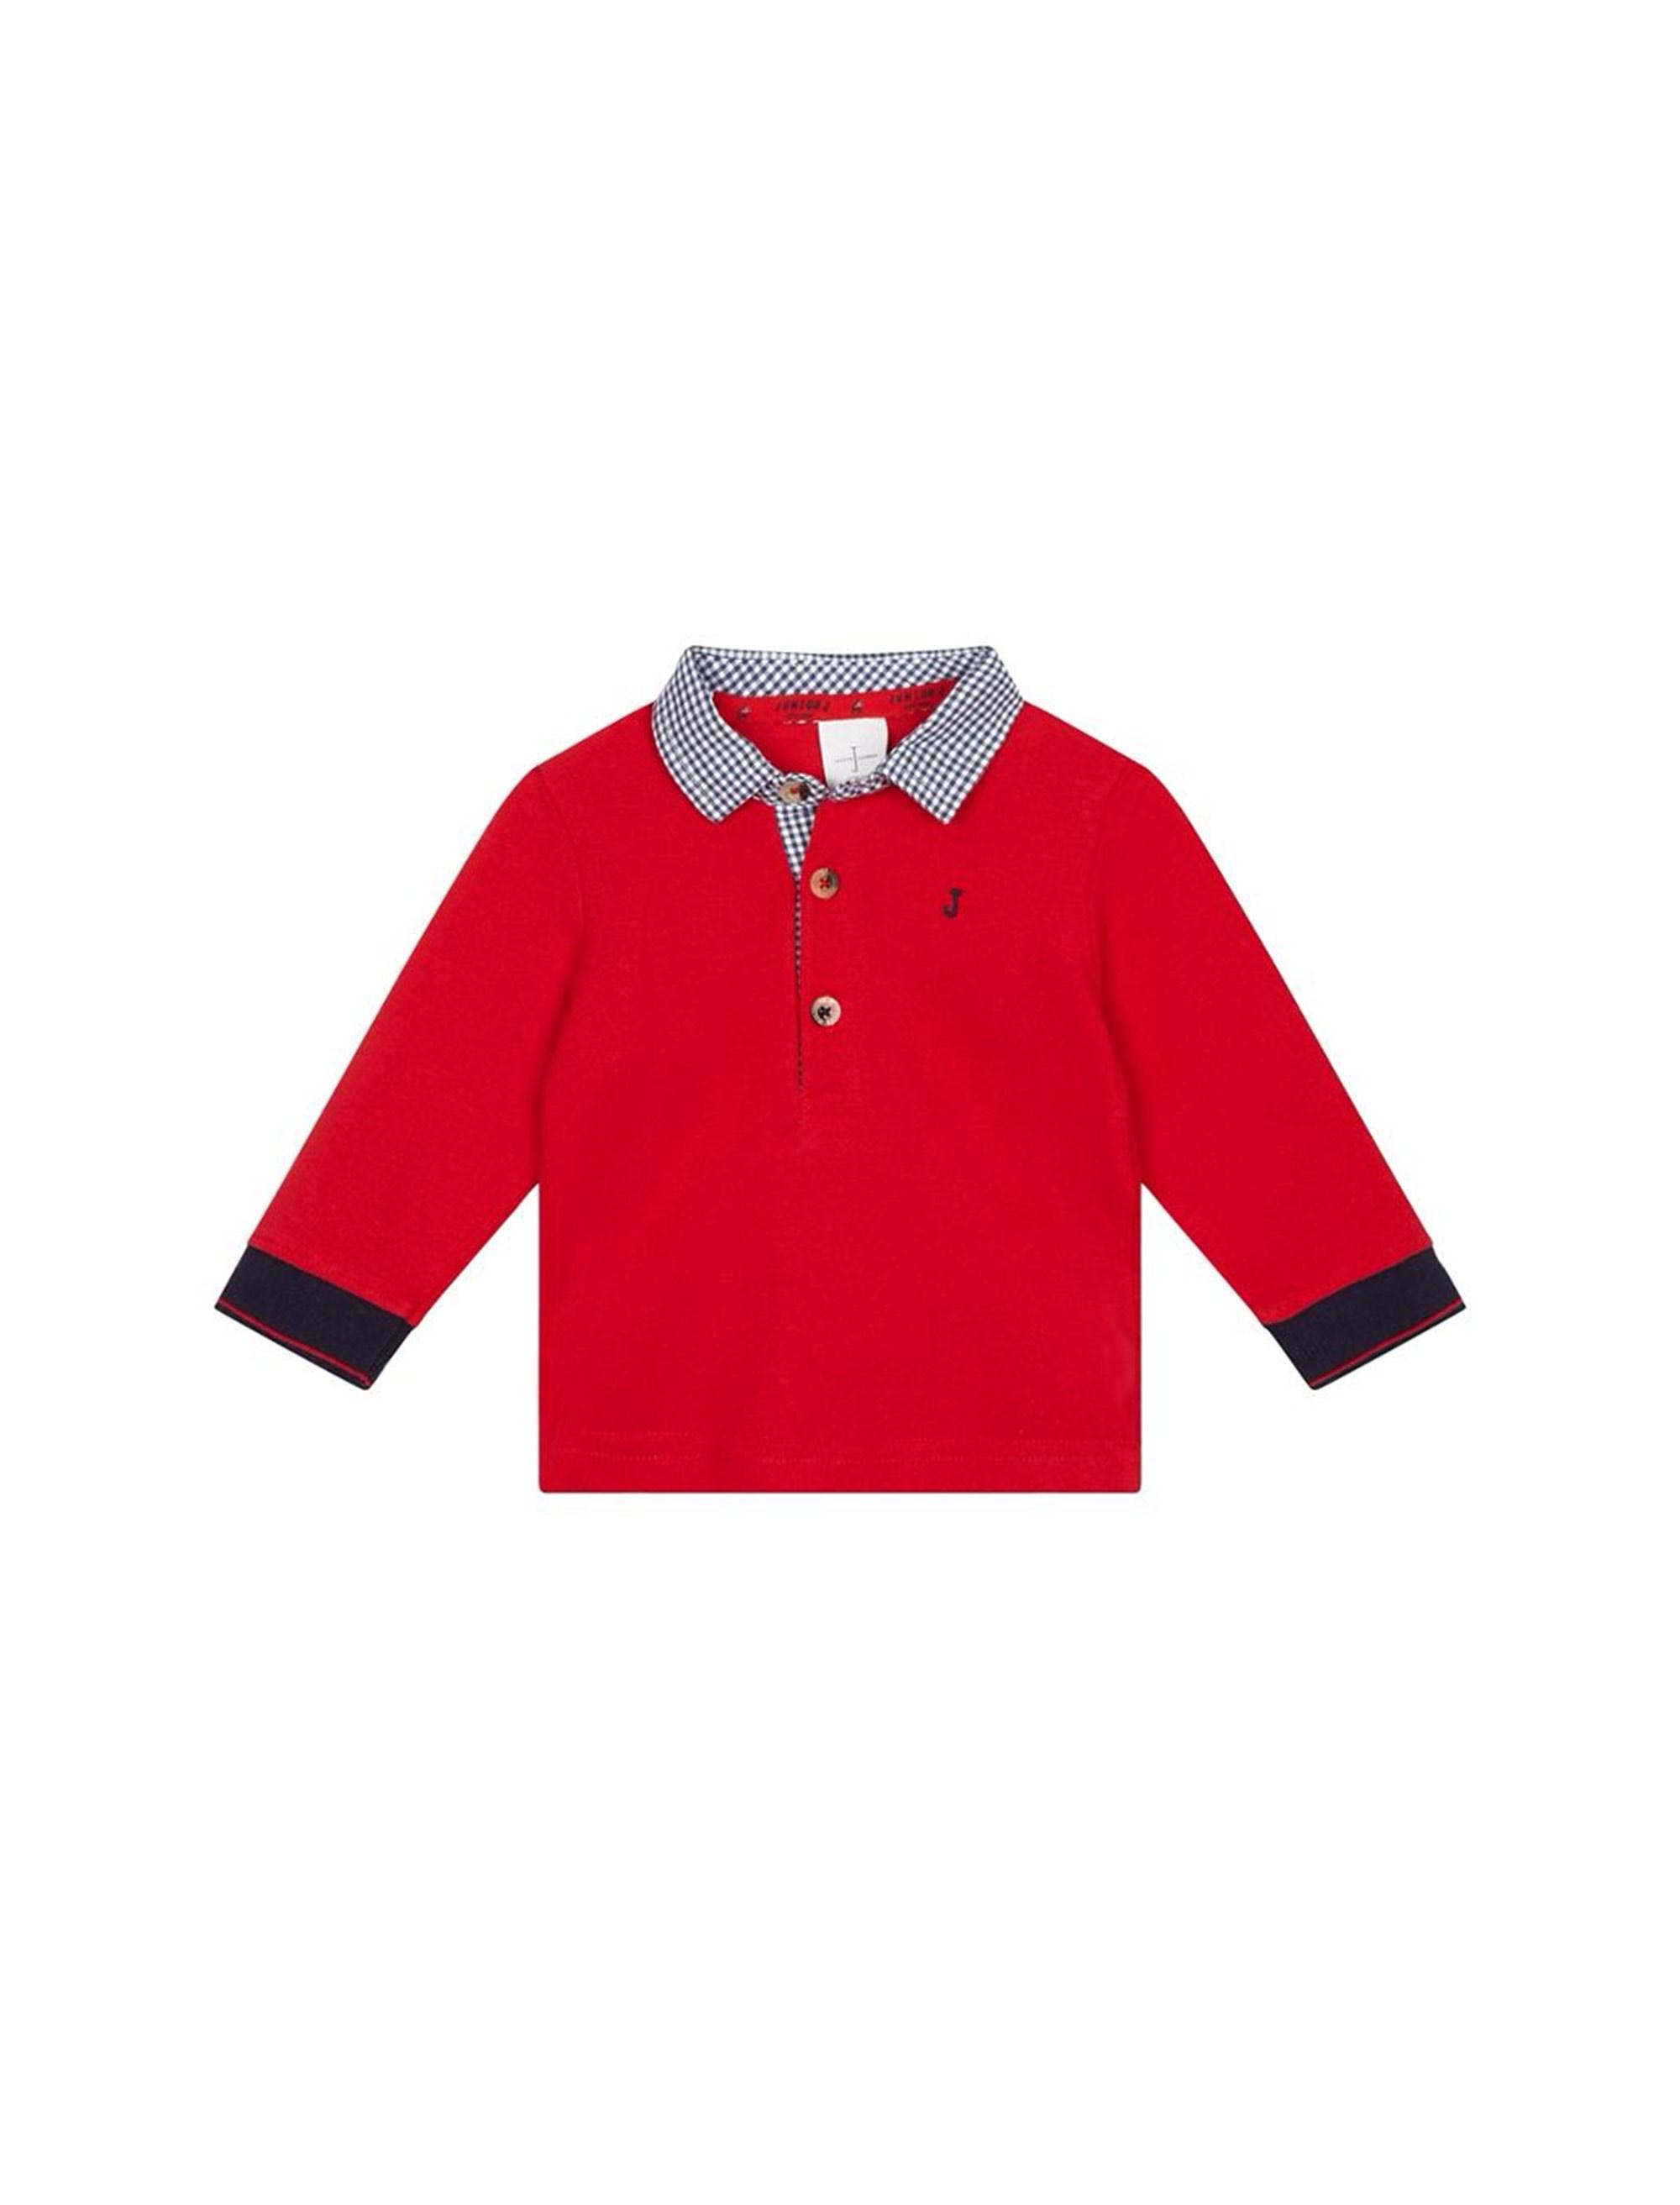 پولوشرت نخی ساده نوزادی پسرانه - قرمز - 1